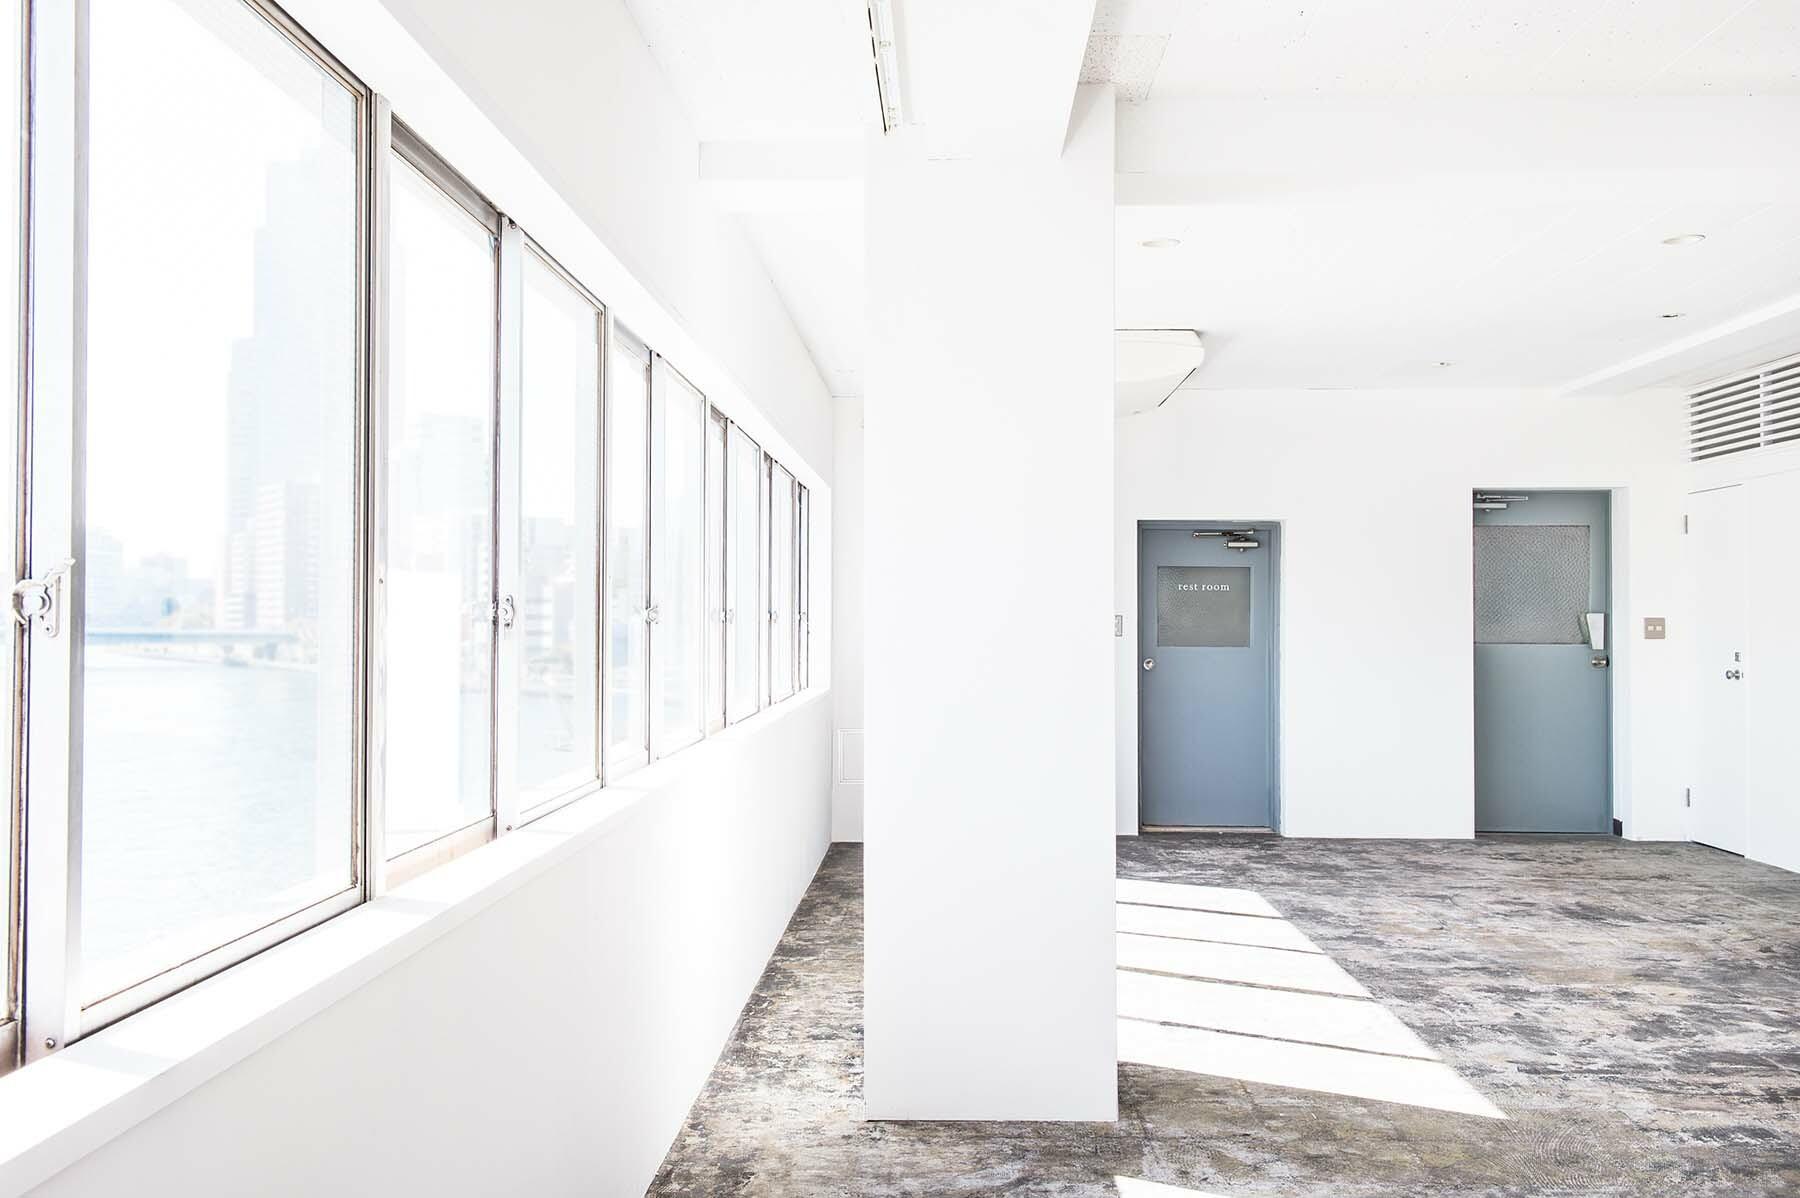 StudioBRICK 4F (スタジオブリック八丁堀4F)南東側の一連の窓